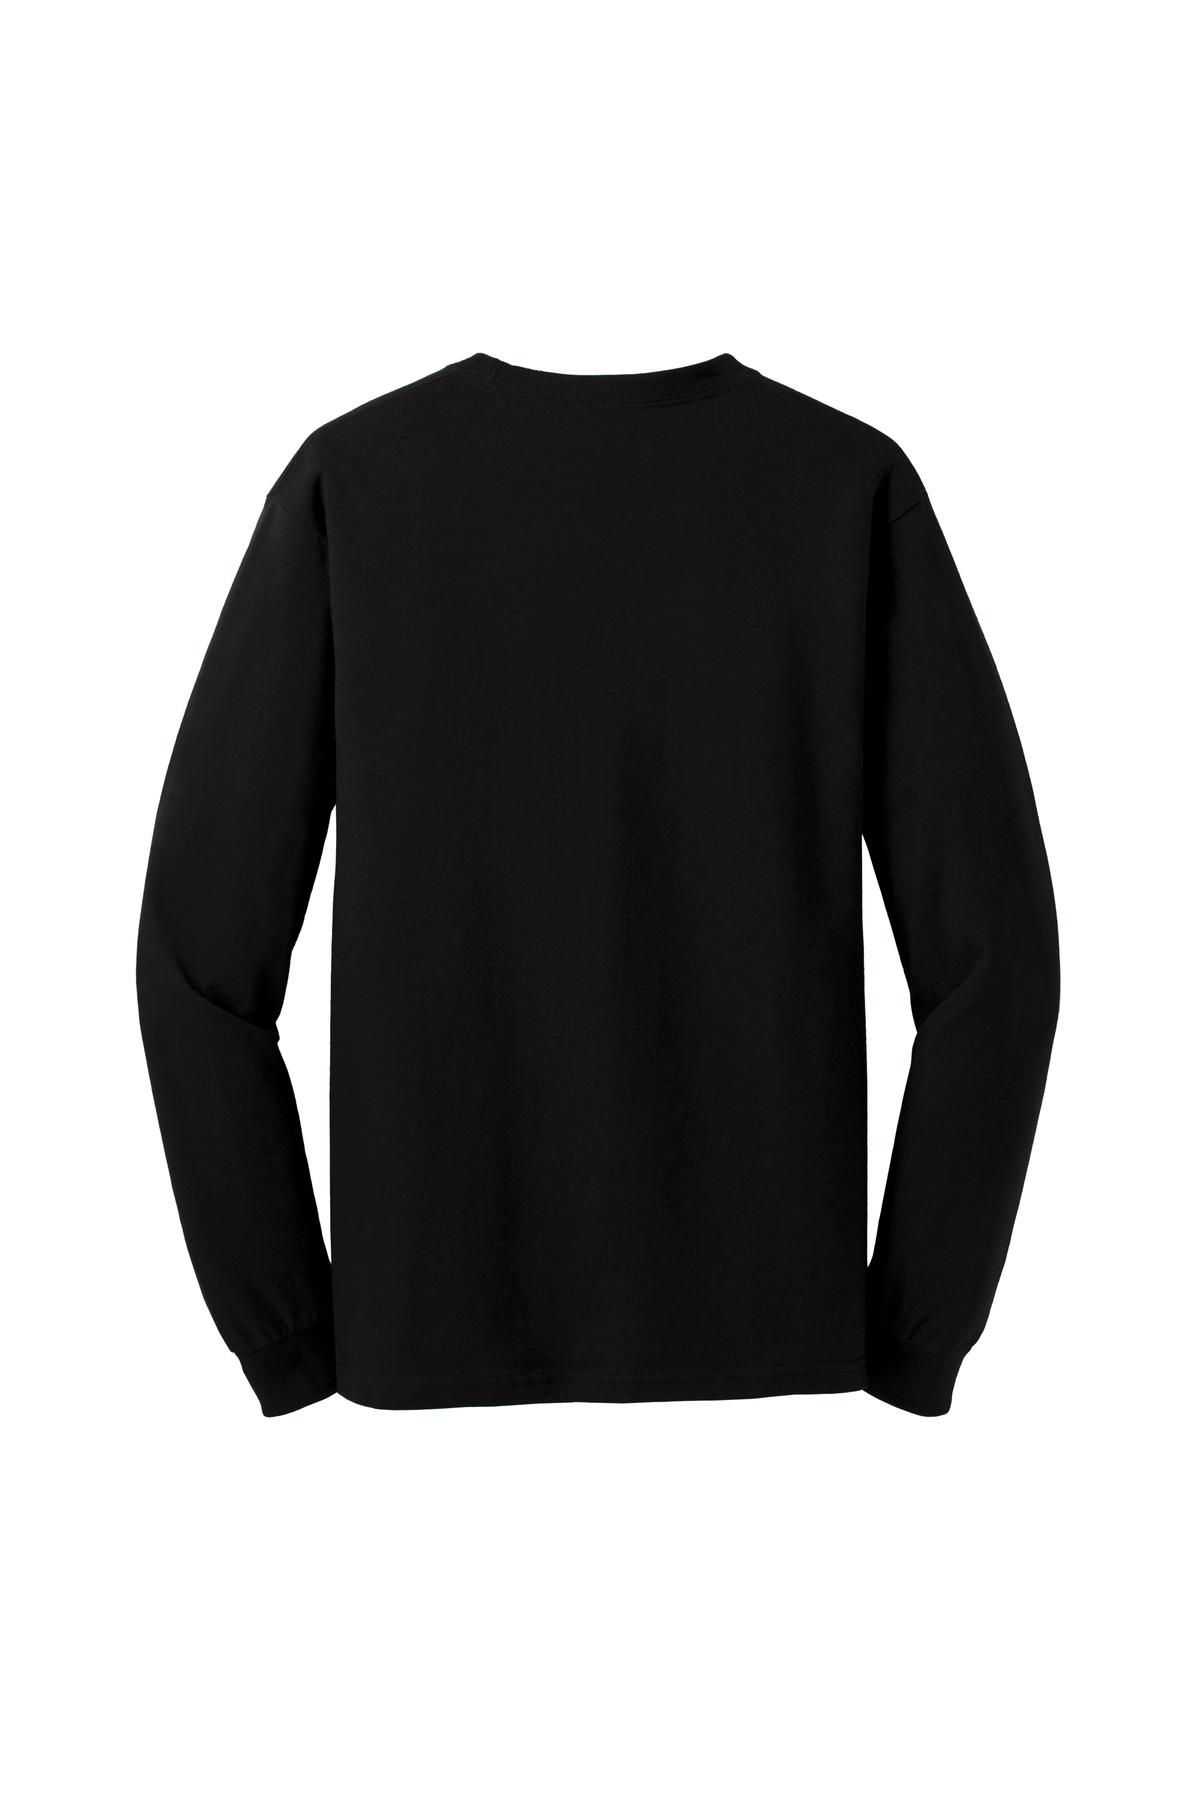 Gildan Heavy Cotton 100 Cotton Long Sleeve T Shirt